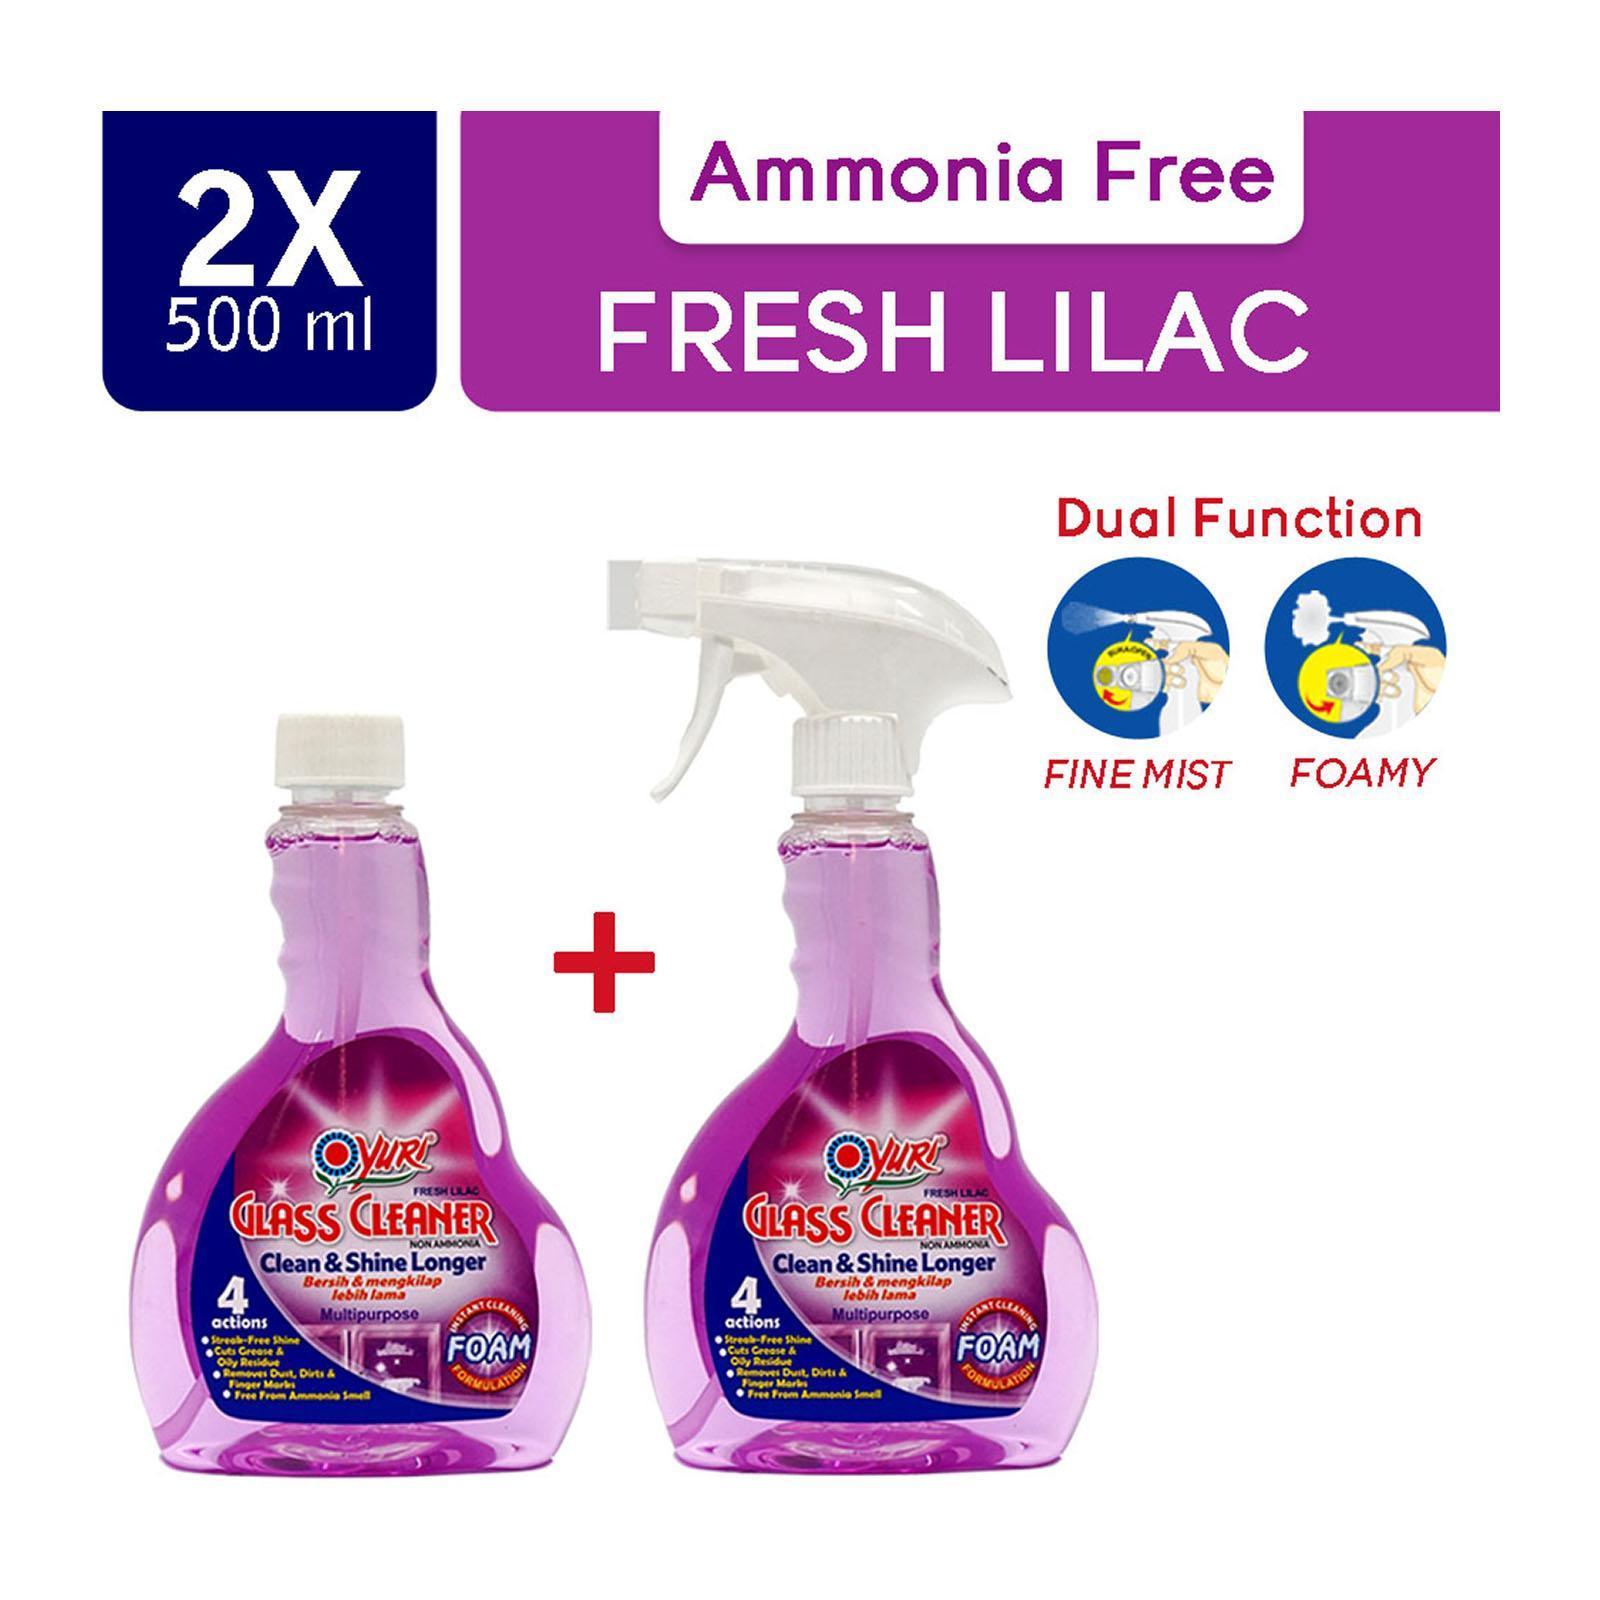 Yuri Glass Cleaner Fresh Lilac